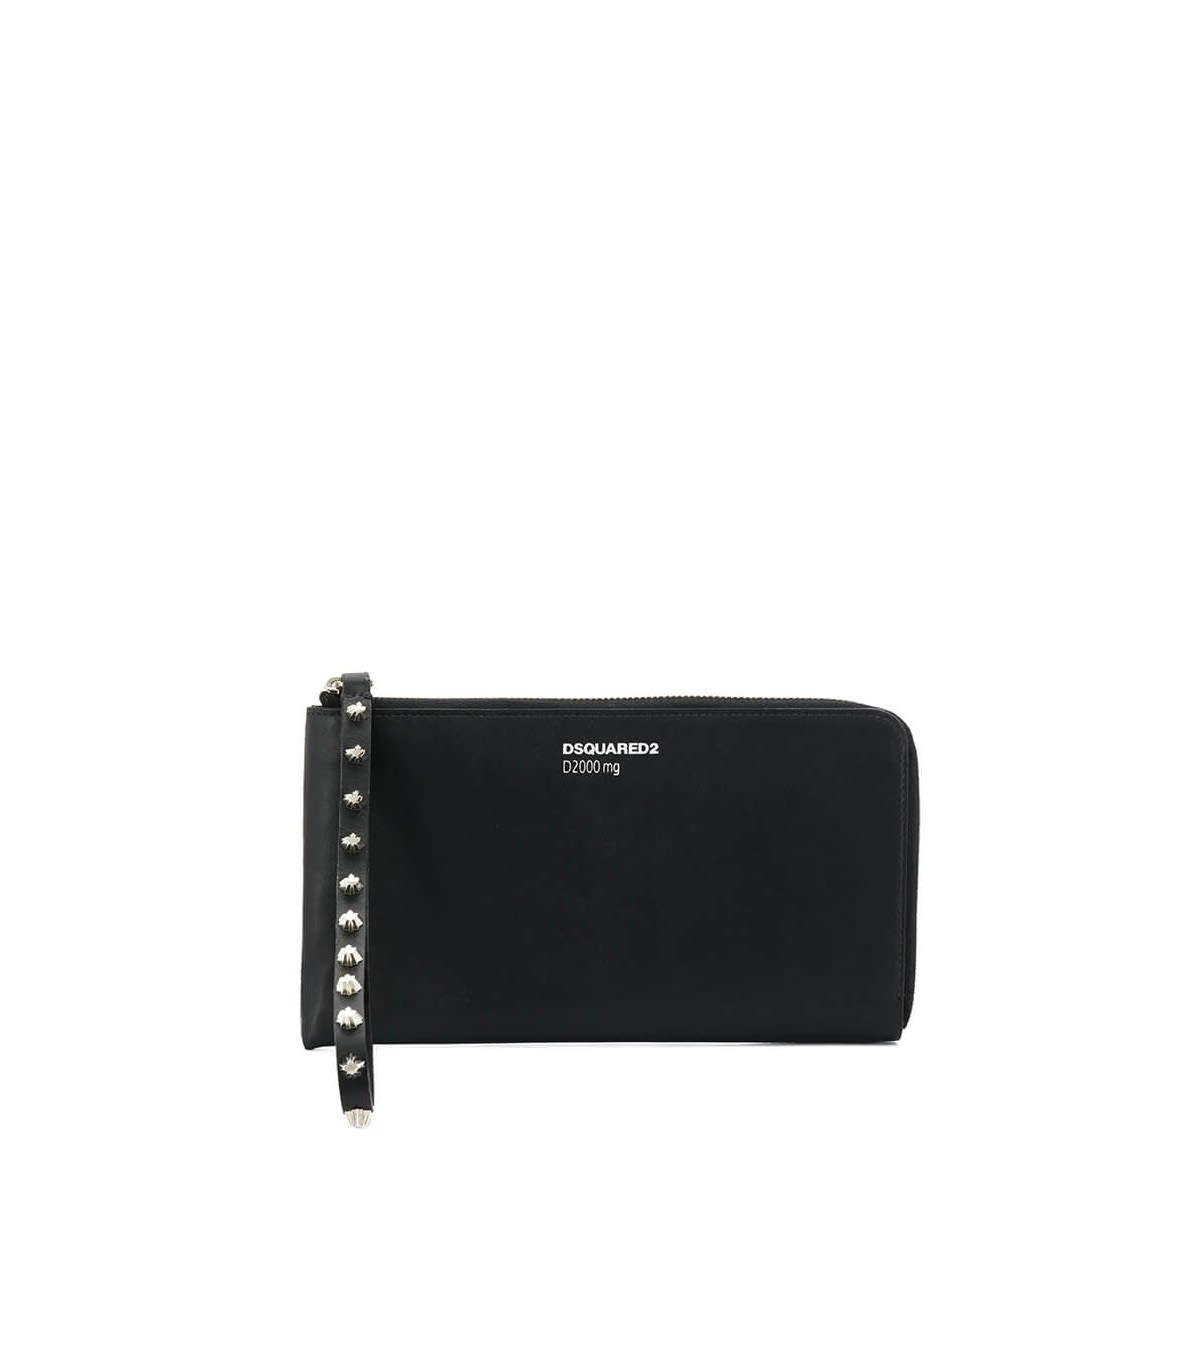 Dsquared2 Black Leather Wallet